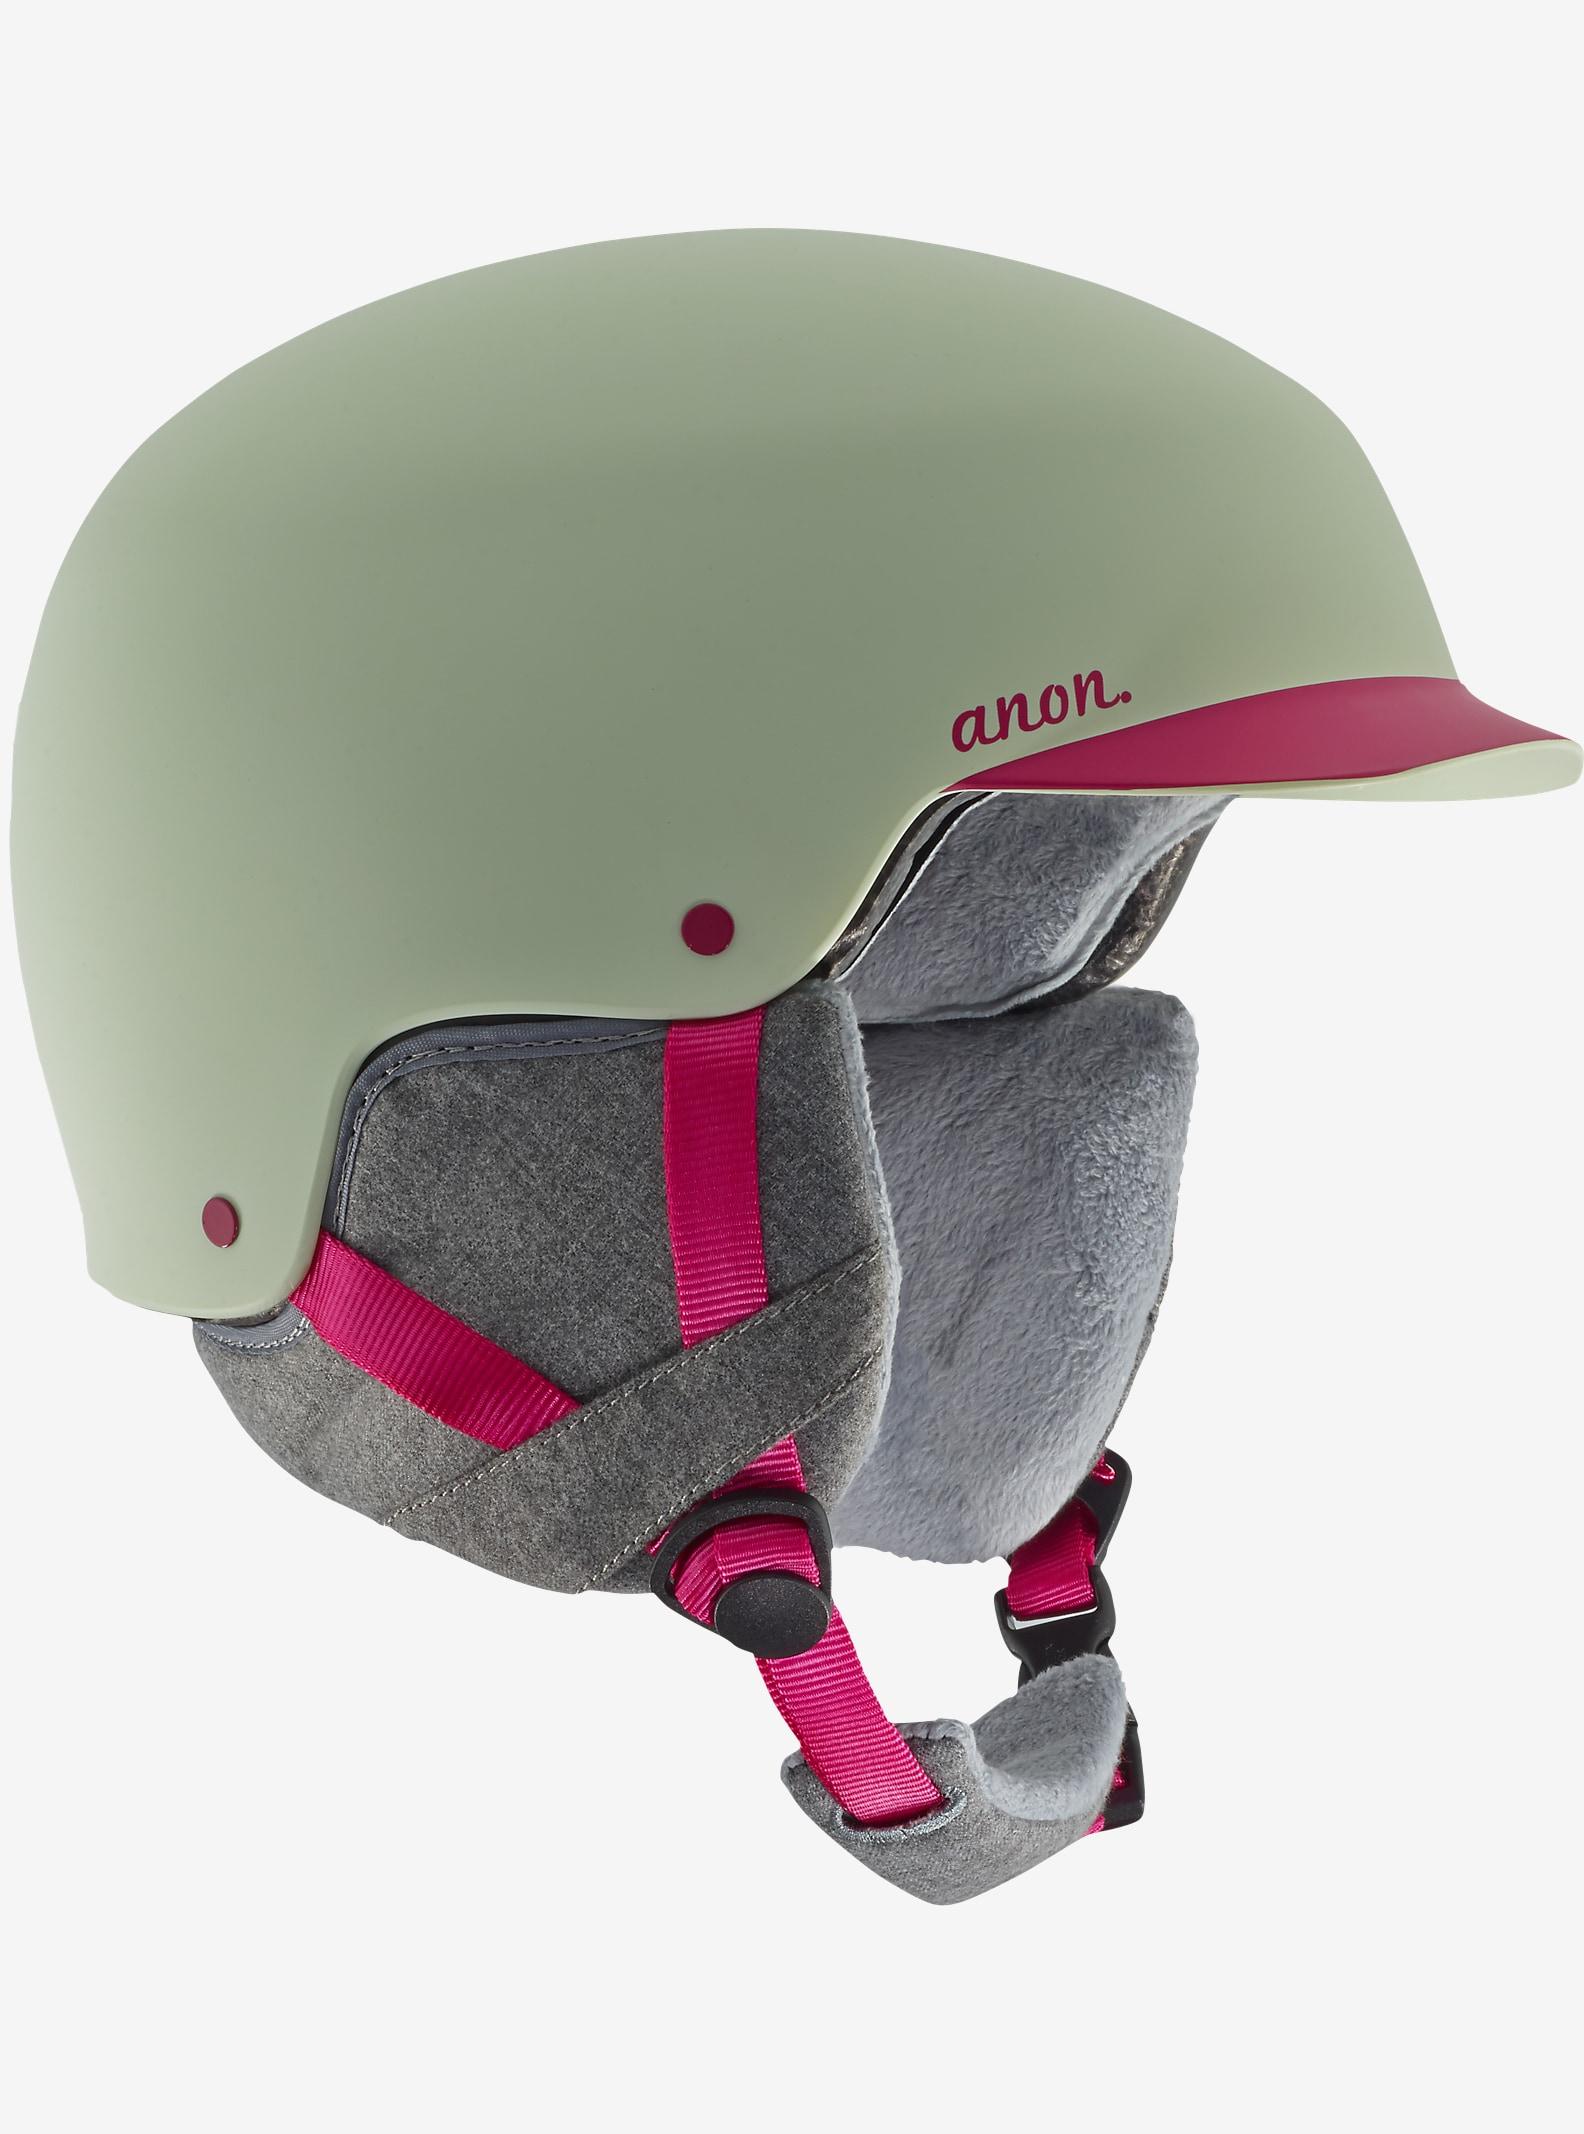 anon. Aera Helmet shown in Strawberry Cream